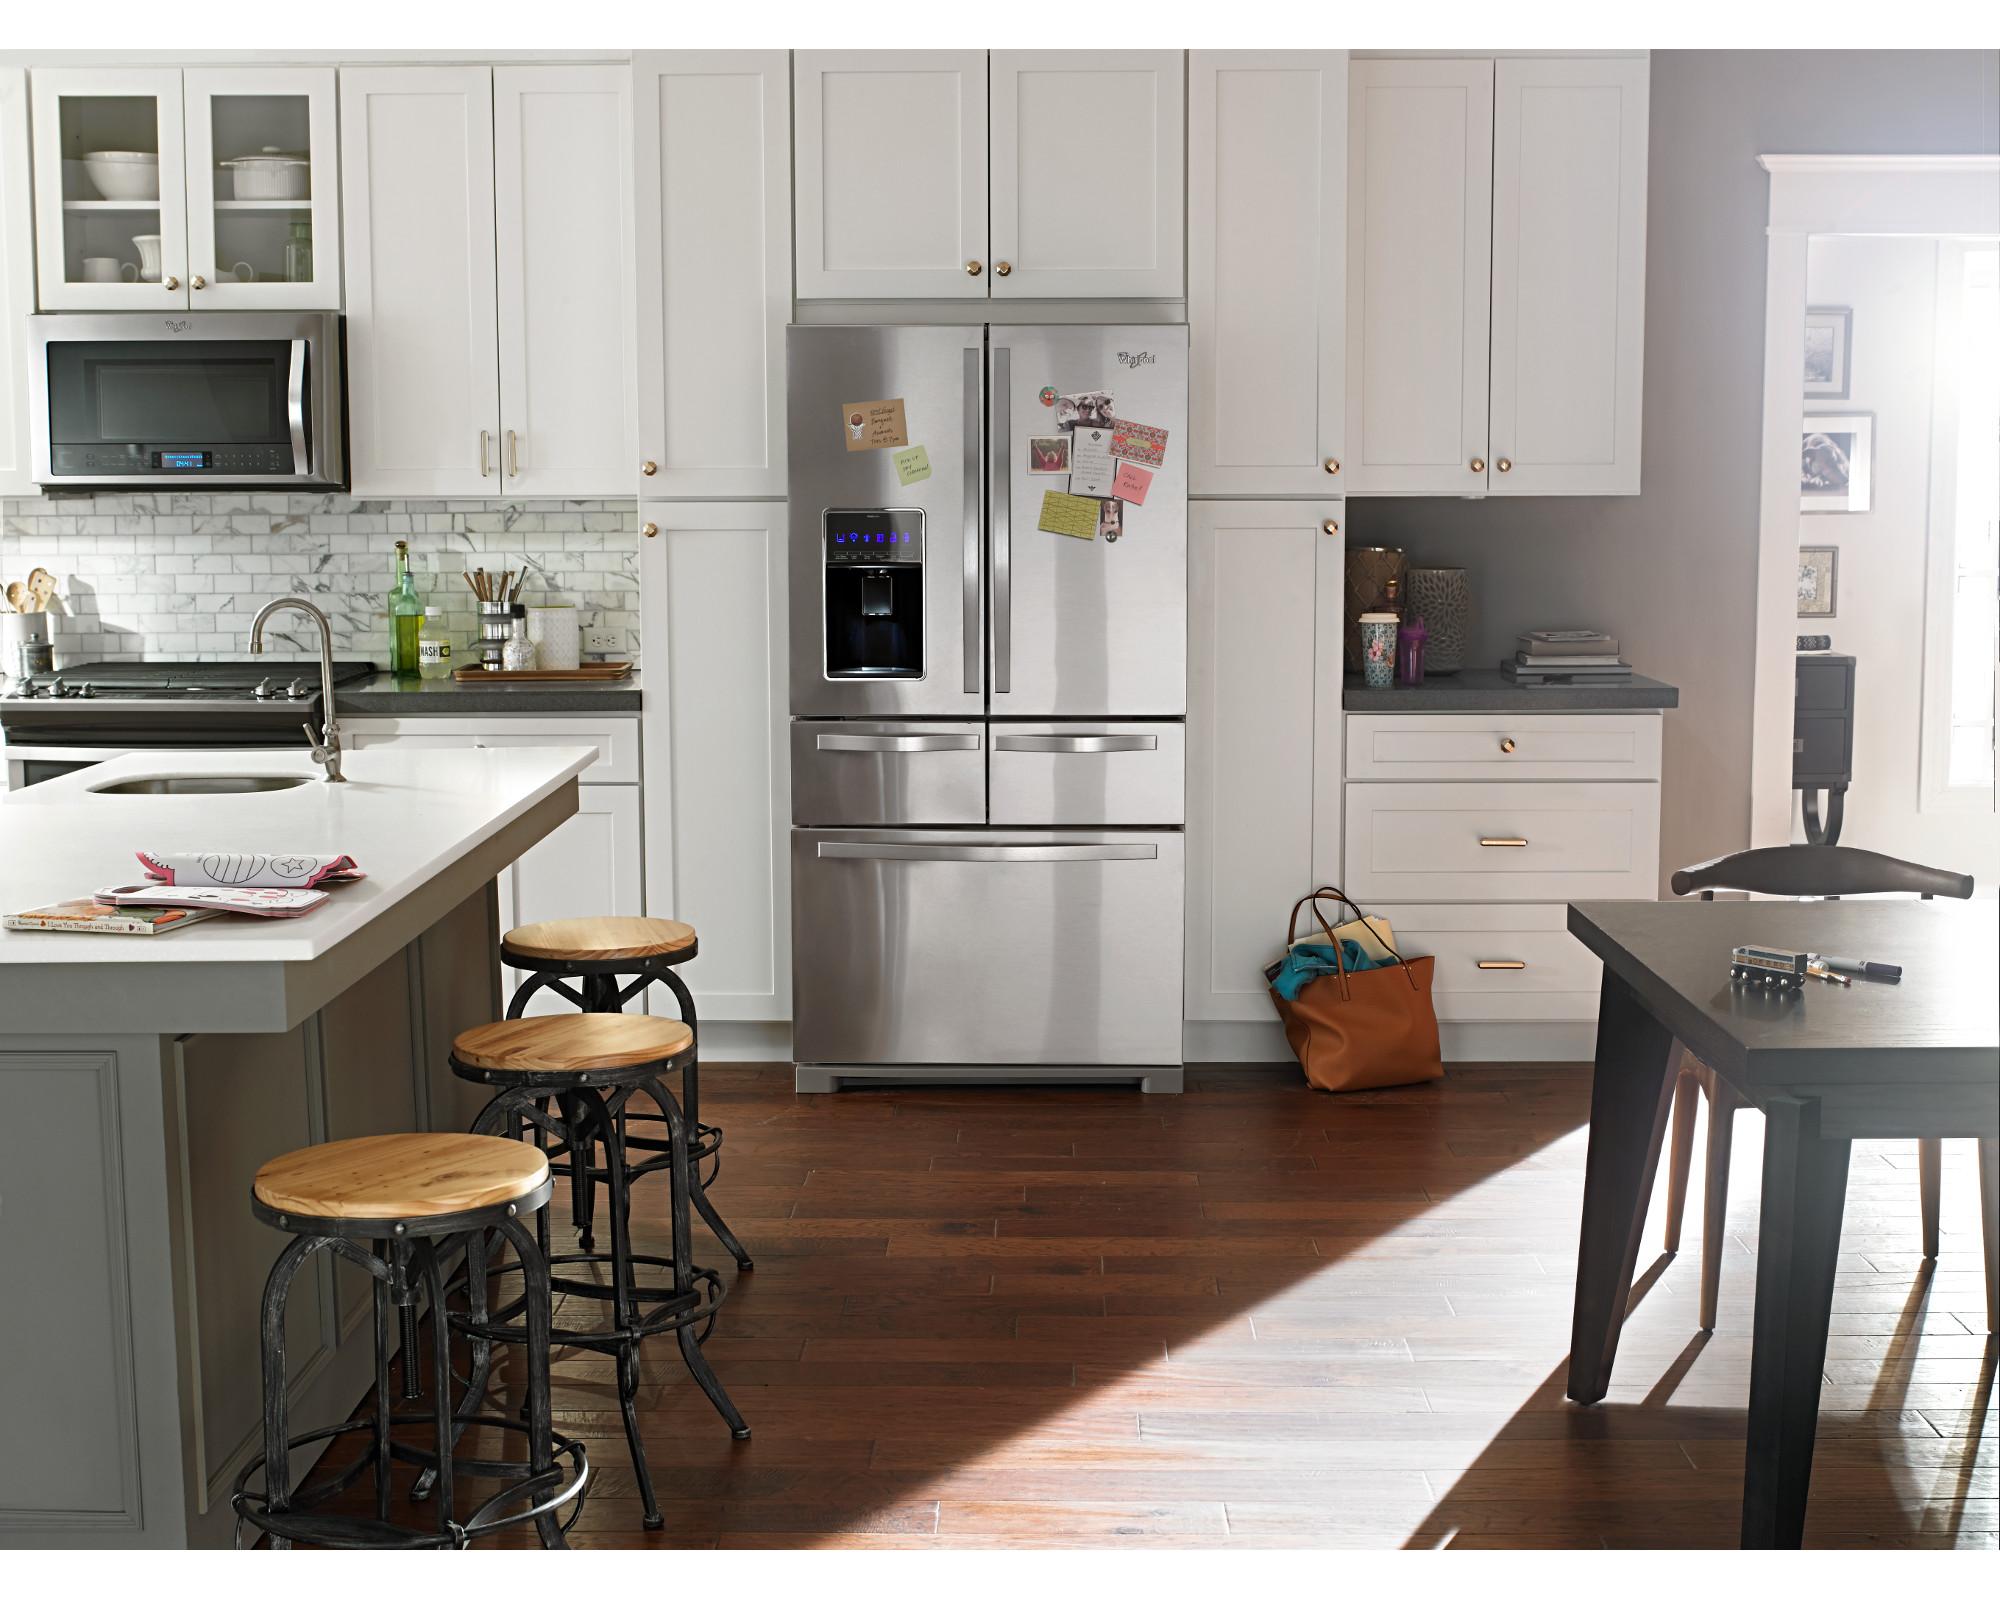 Whirlpool WRV996FDEM 26 cu. ft. French Door Bottom Freezer Refrigerator - Stainless Steel